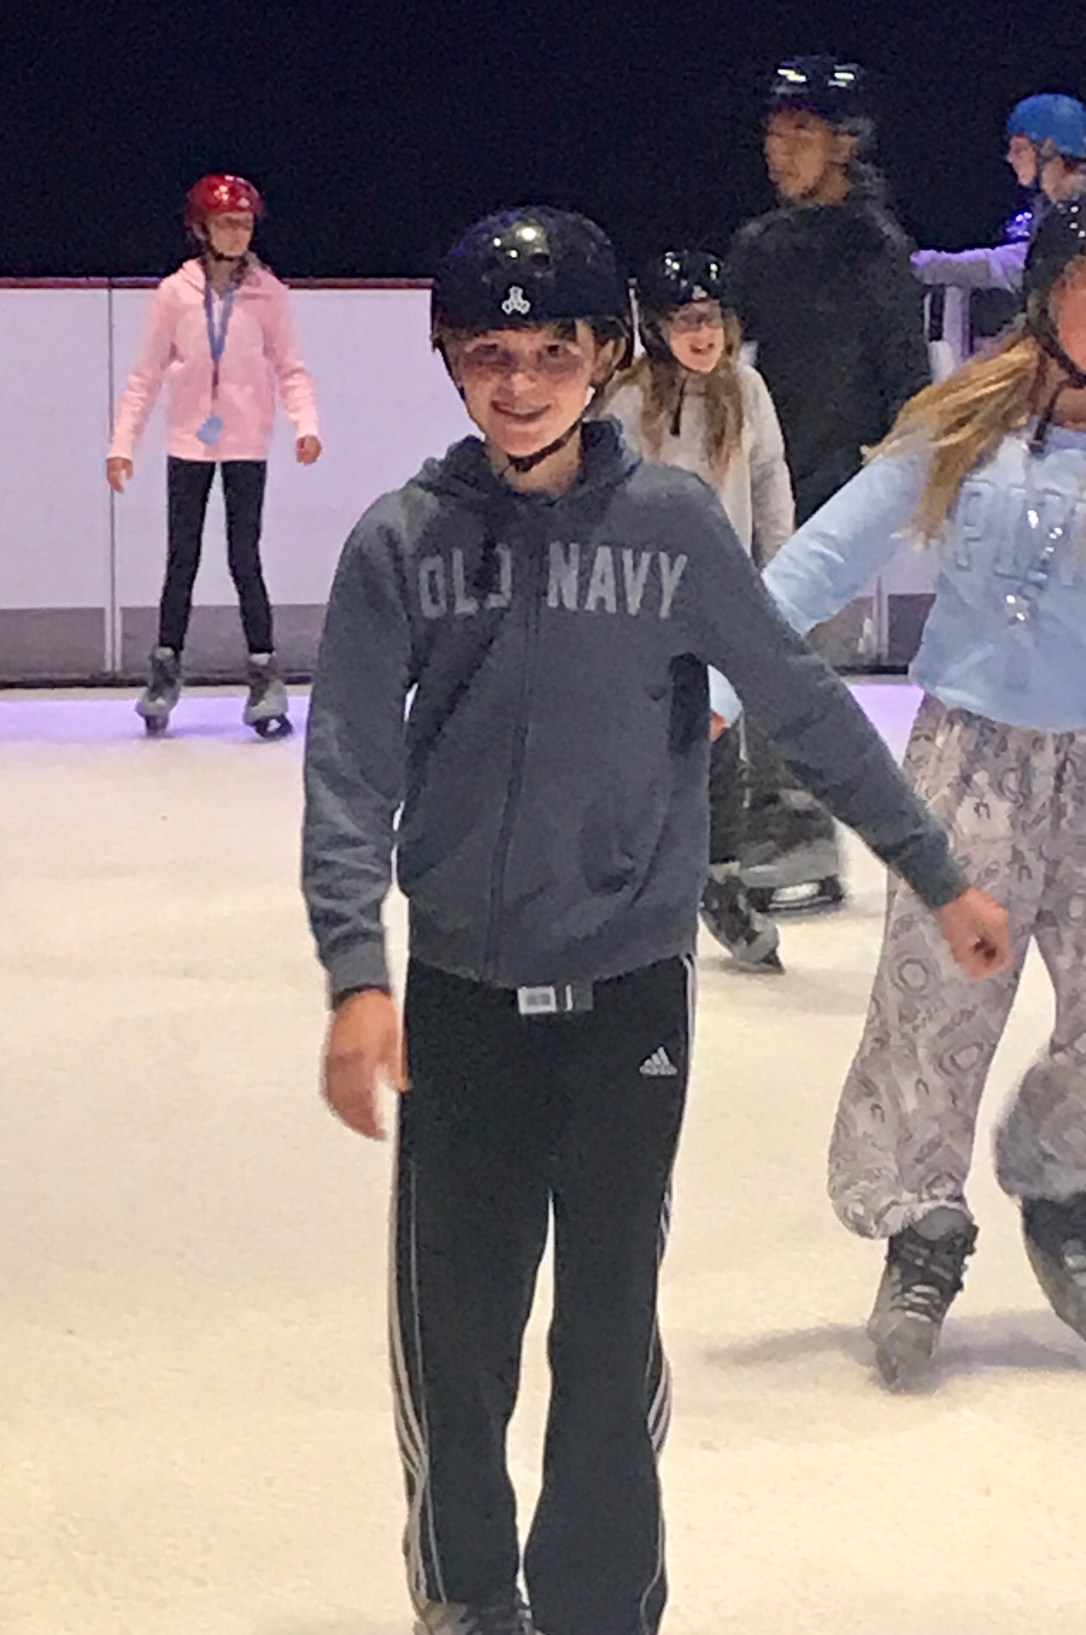 Colin skating on Allure